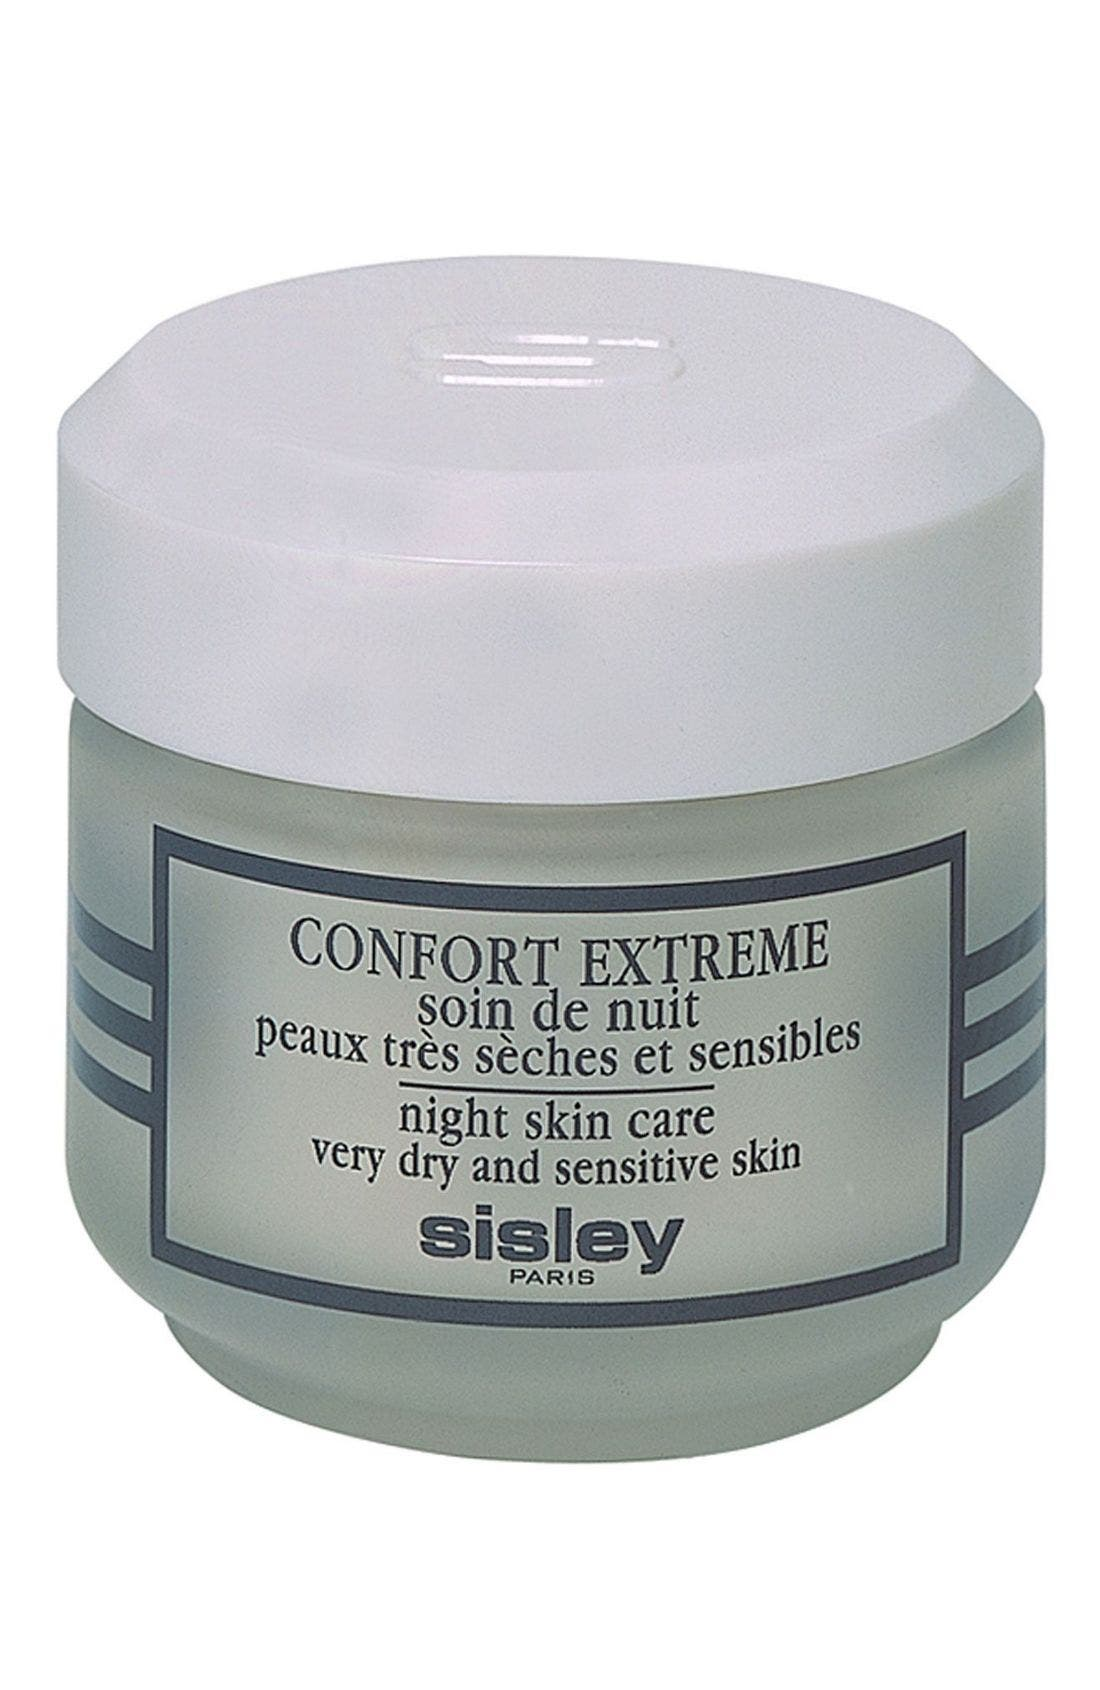 Sisley Paris Confort Extrême Night Skin Care